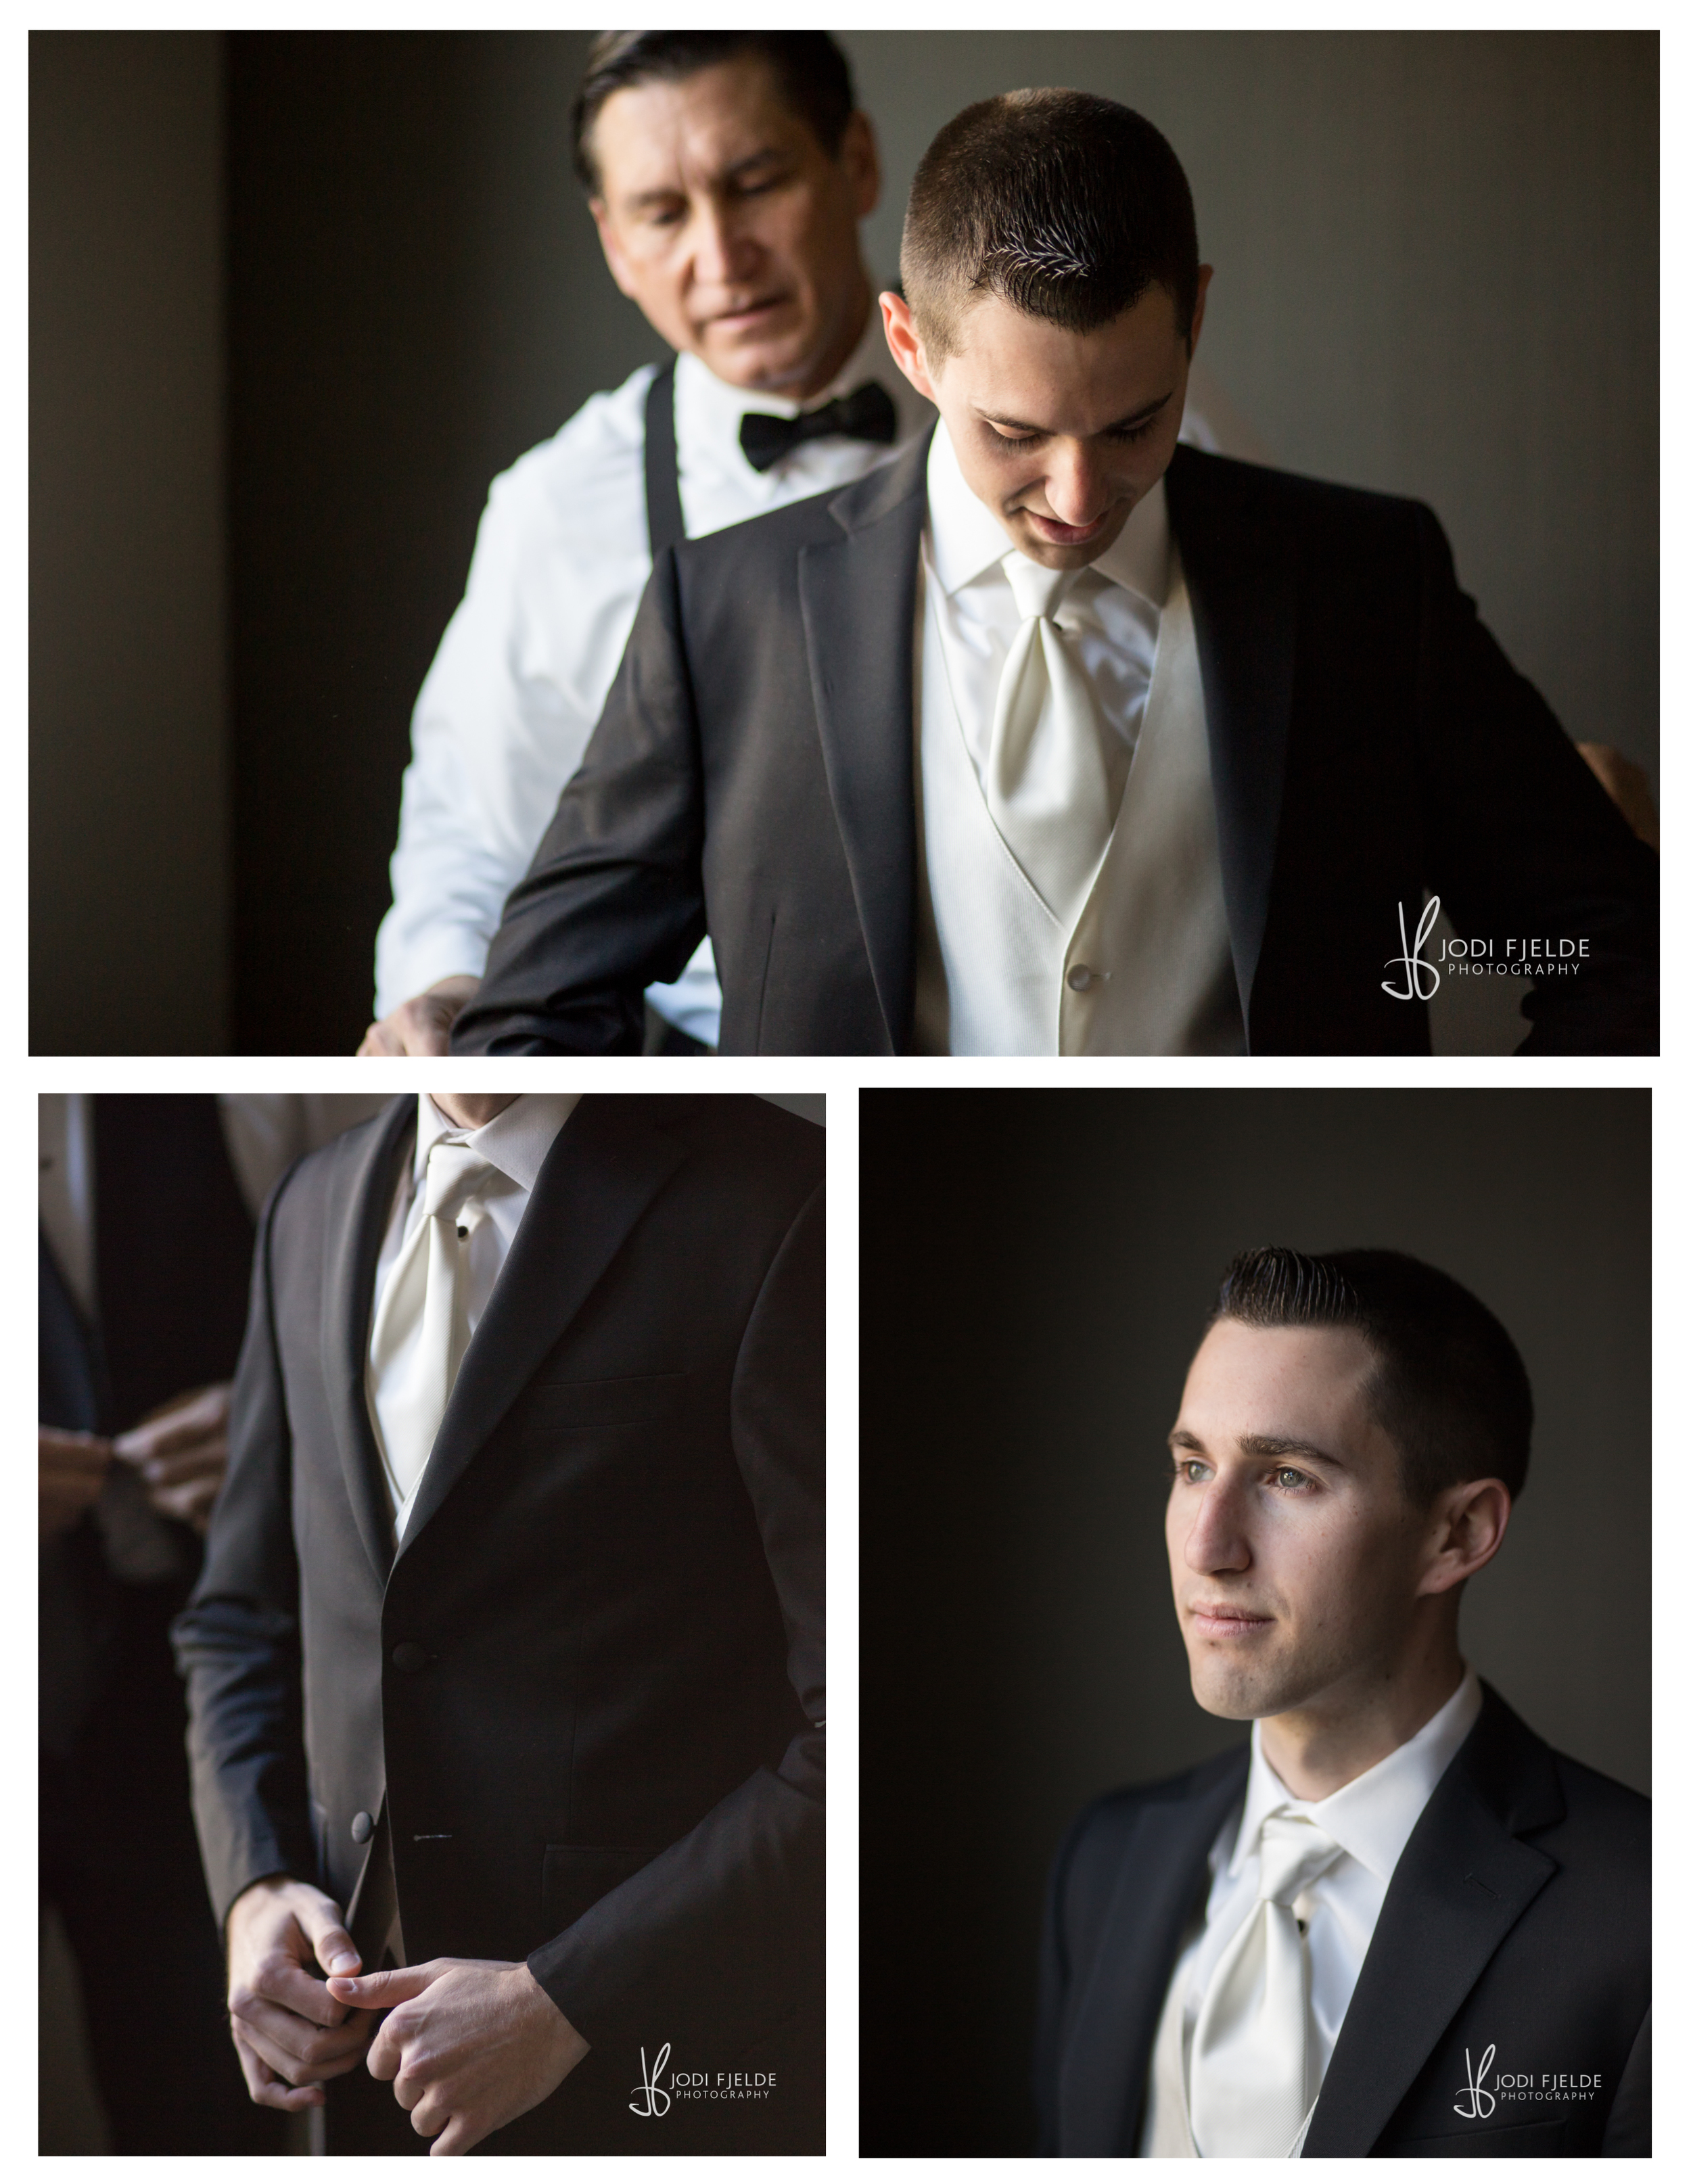 Benvenuto_Palm_Beach_Wedding_Jewish_Michelle & Jason_Jodi_Fjedle_Photography 11.jpg